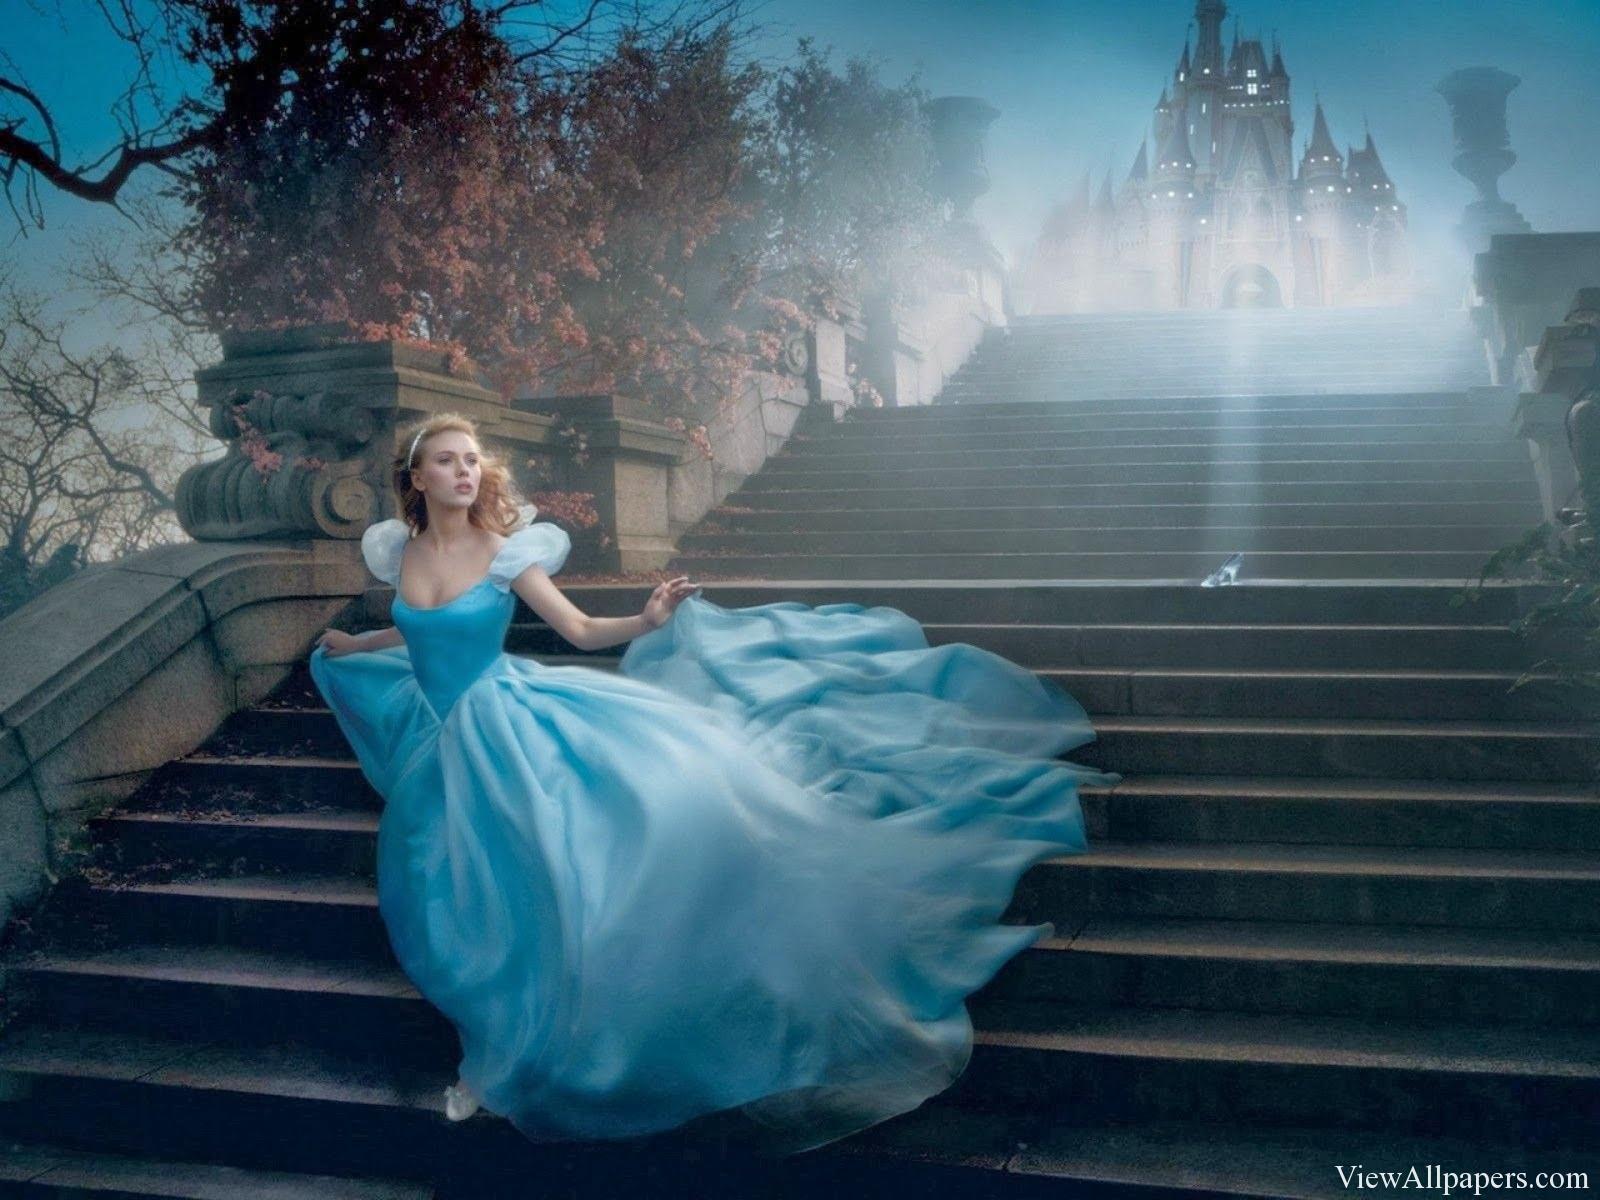 download Cinderella 2015 Wallpaper For PC computers desktop 1600x1200